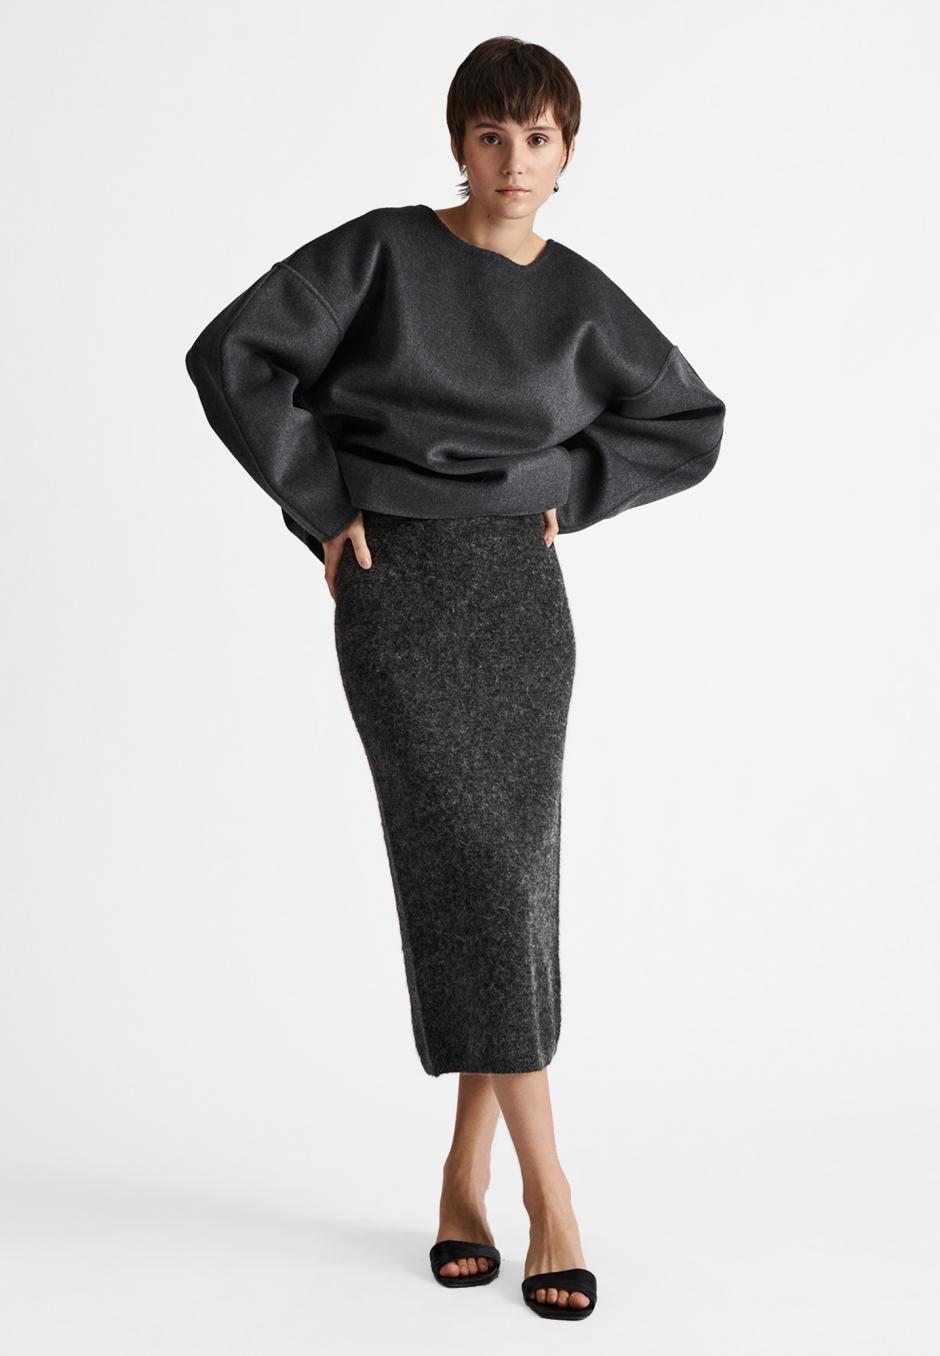 Stylein Elisha Skirt